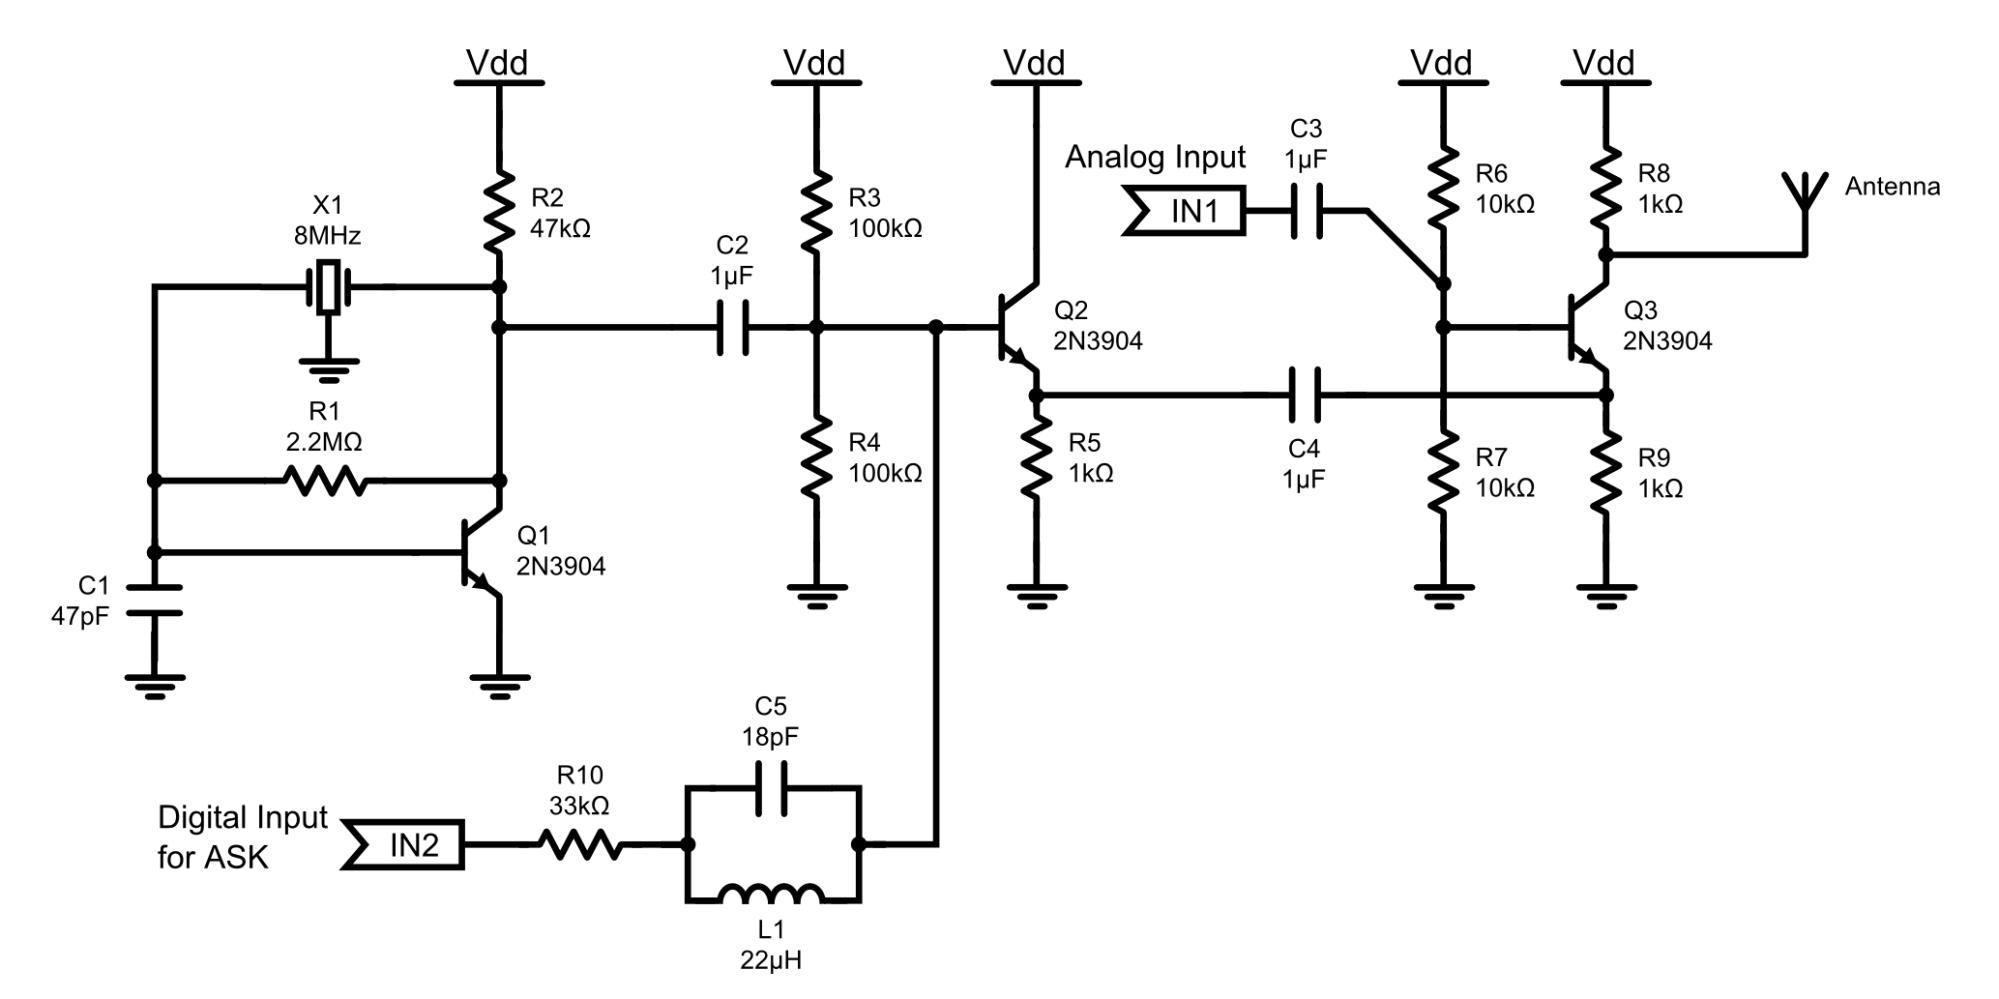 hight resolution of 8mhz am radio transmitter